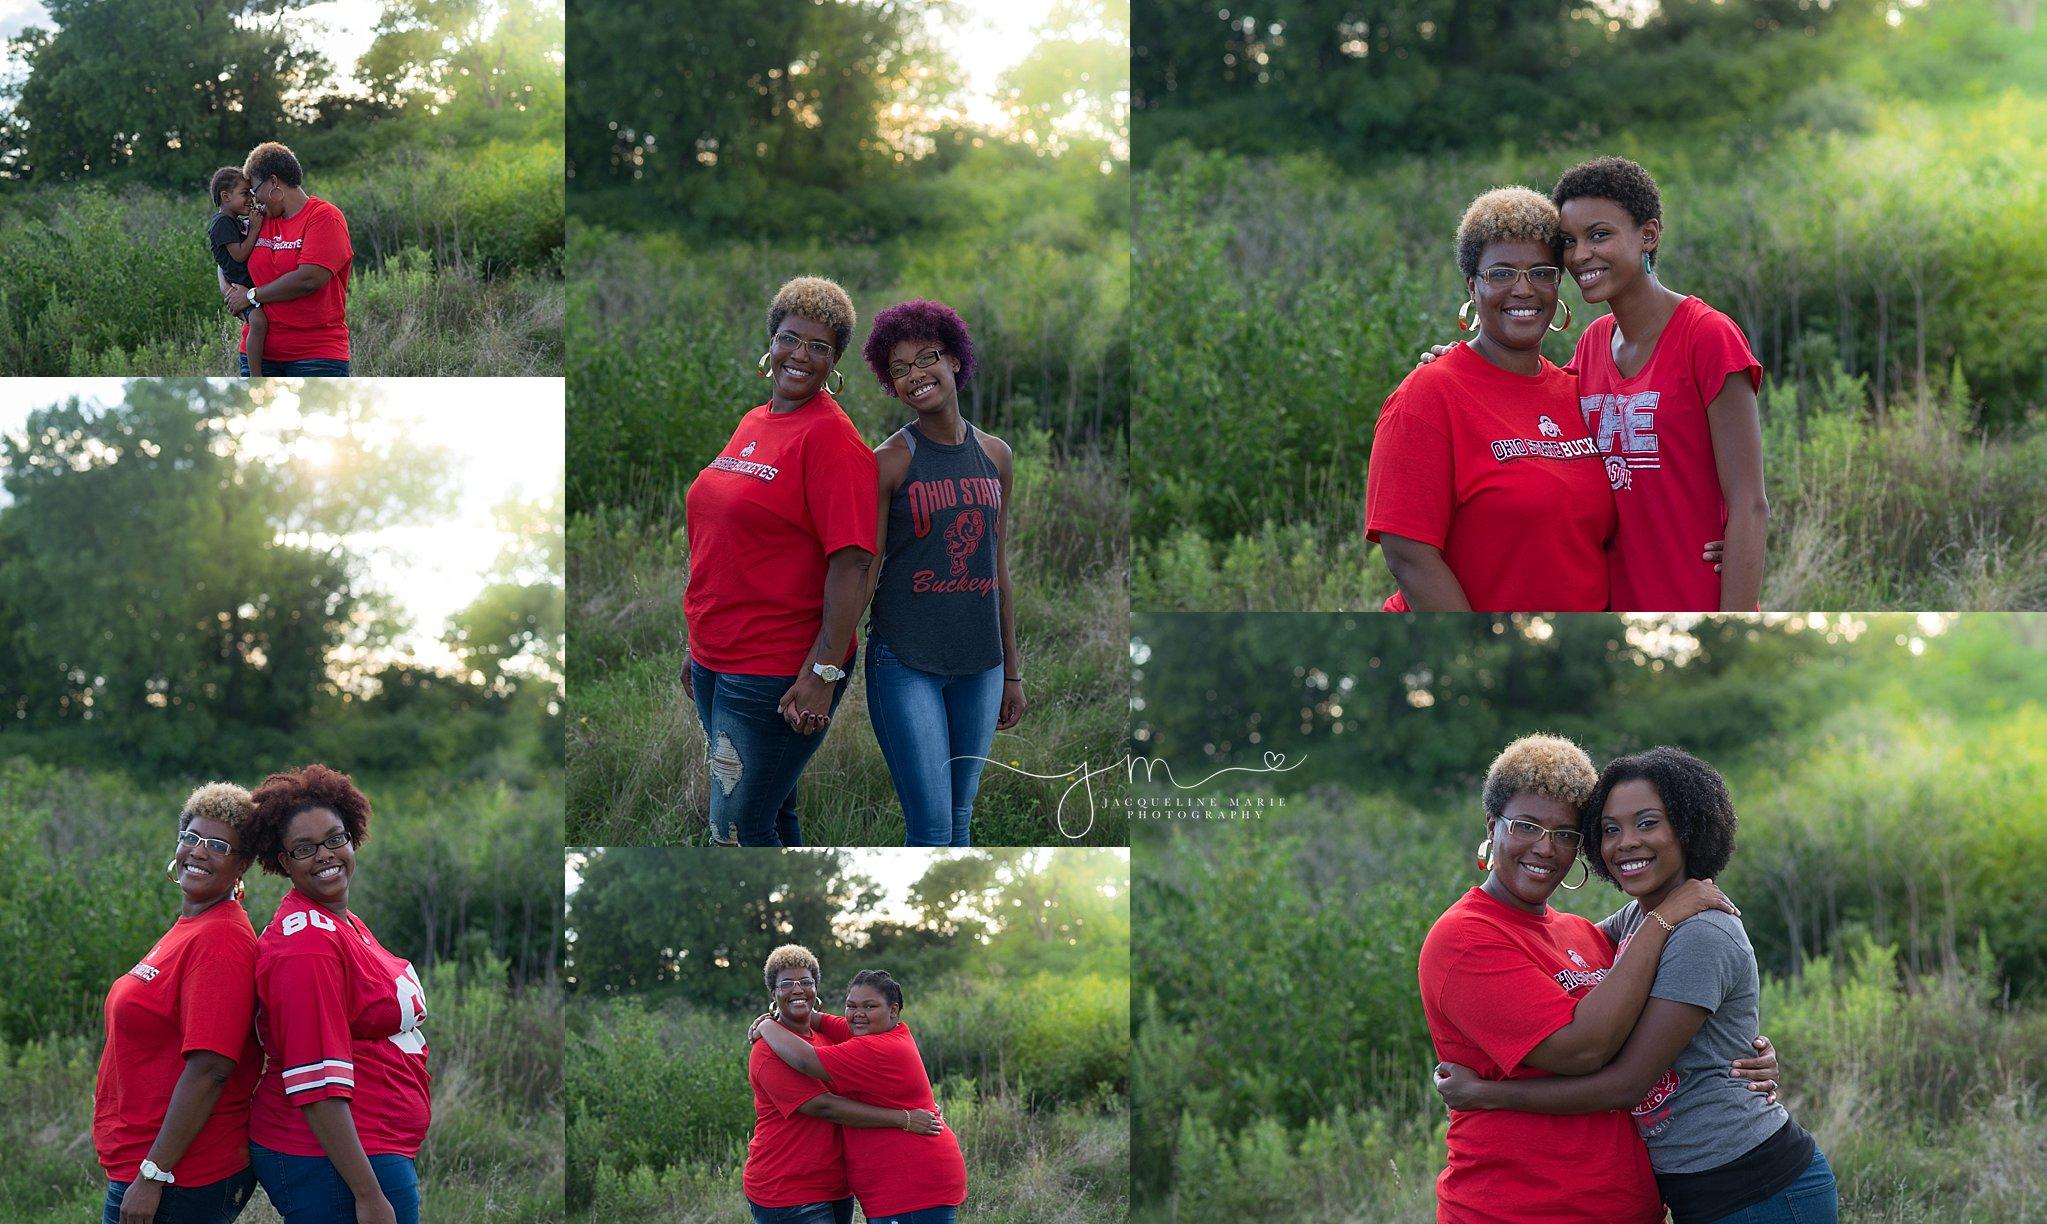 Columbus Ohio family photographer, family photography Columbus, sisters, sibling photography, outdoor family photography Columbus